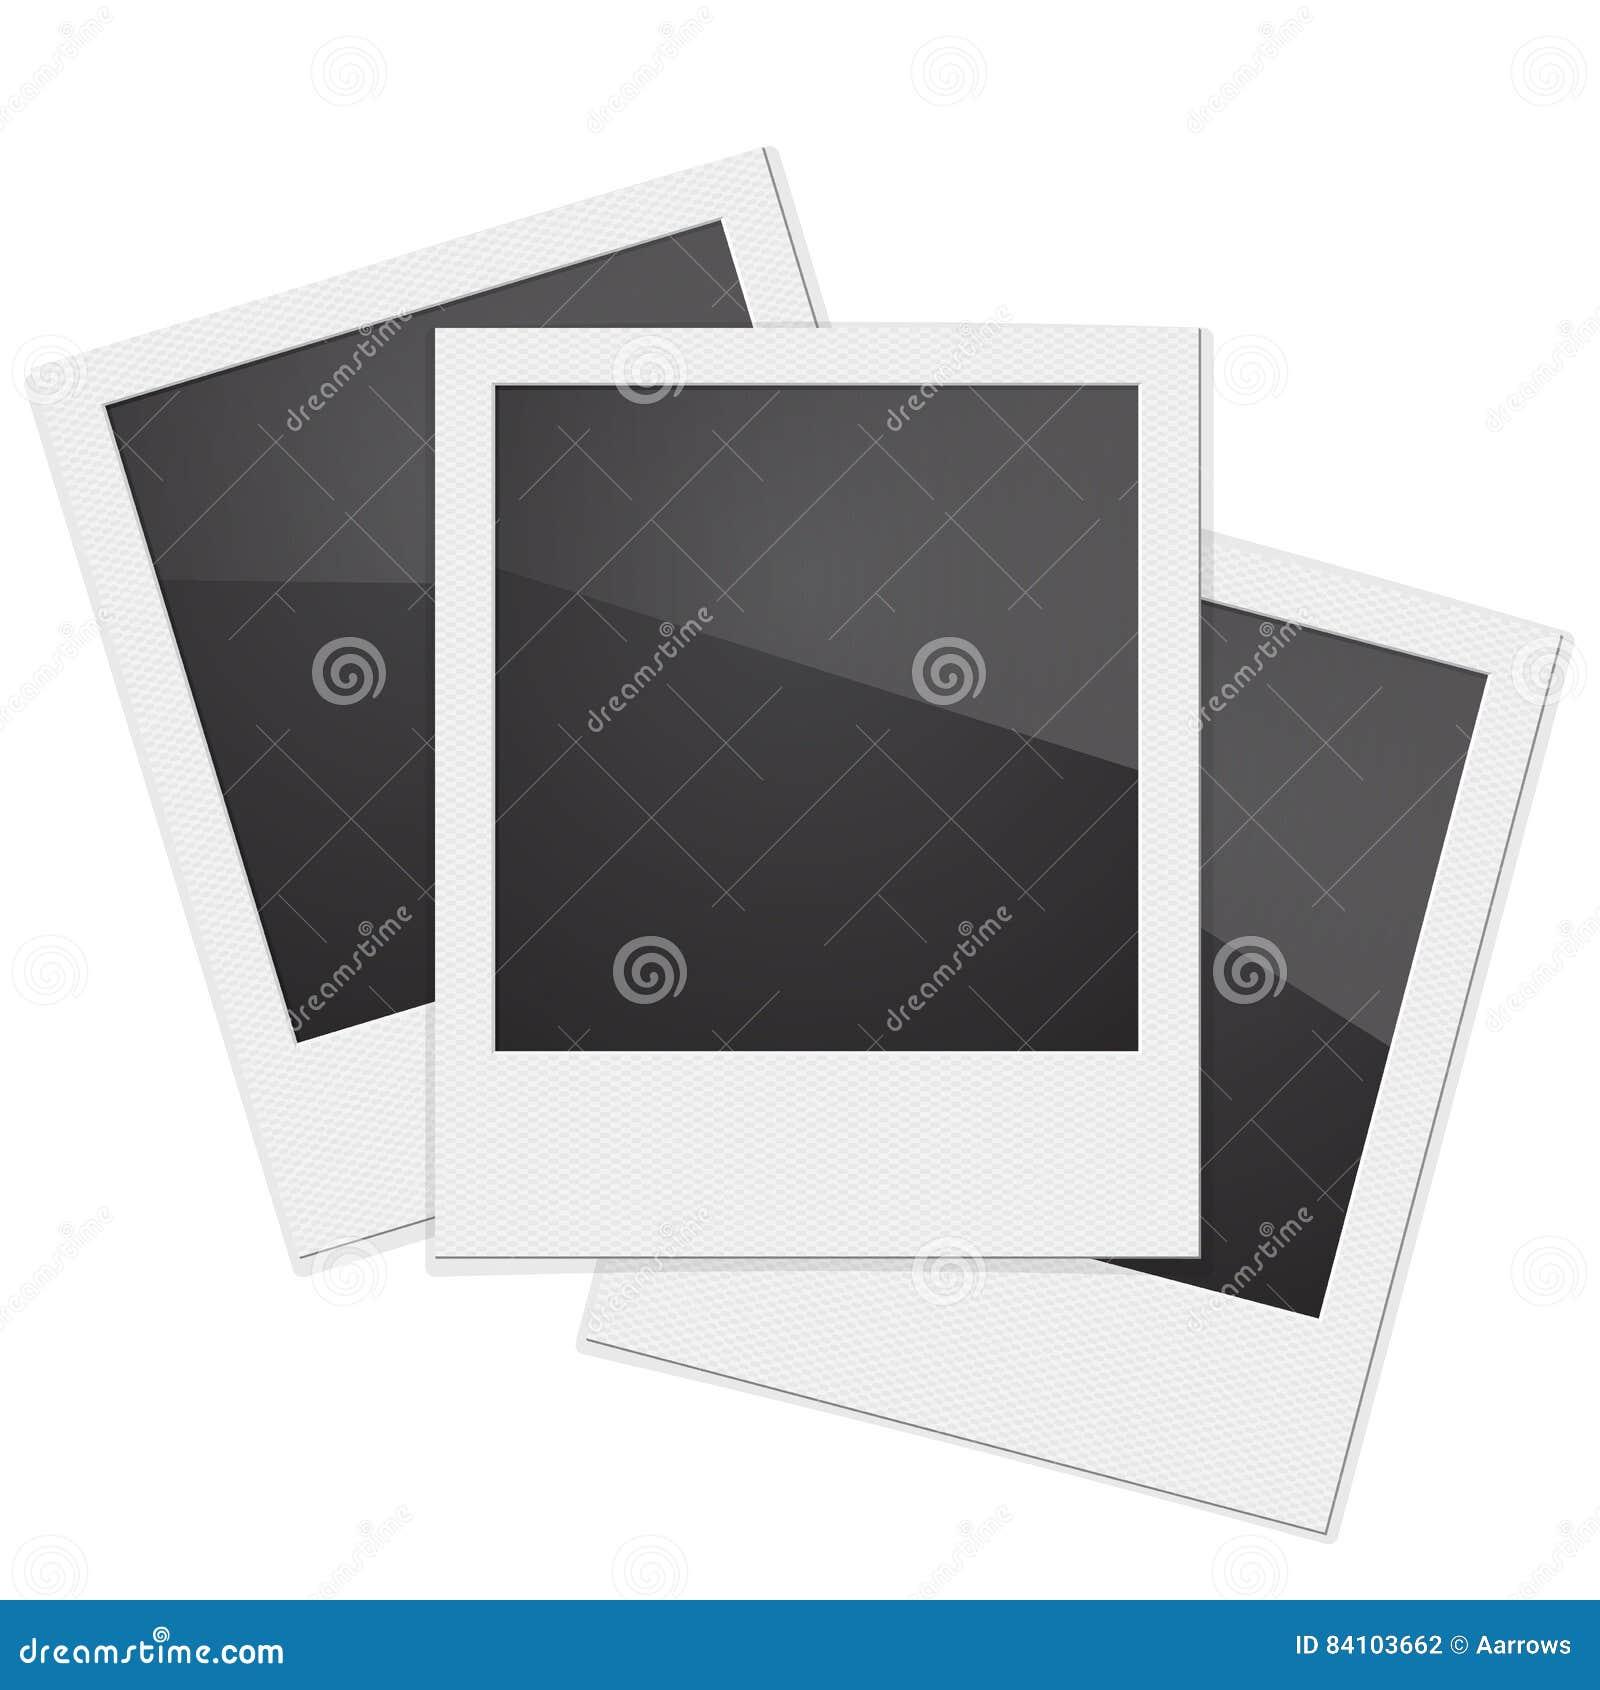 Beste Langer Multi Fotorahmen Galerie - Benutzerdefinierte ...